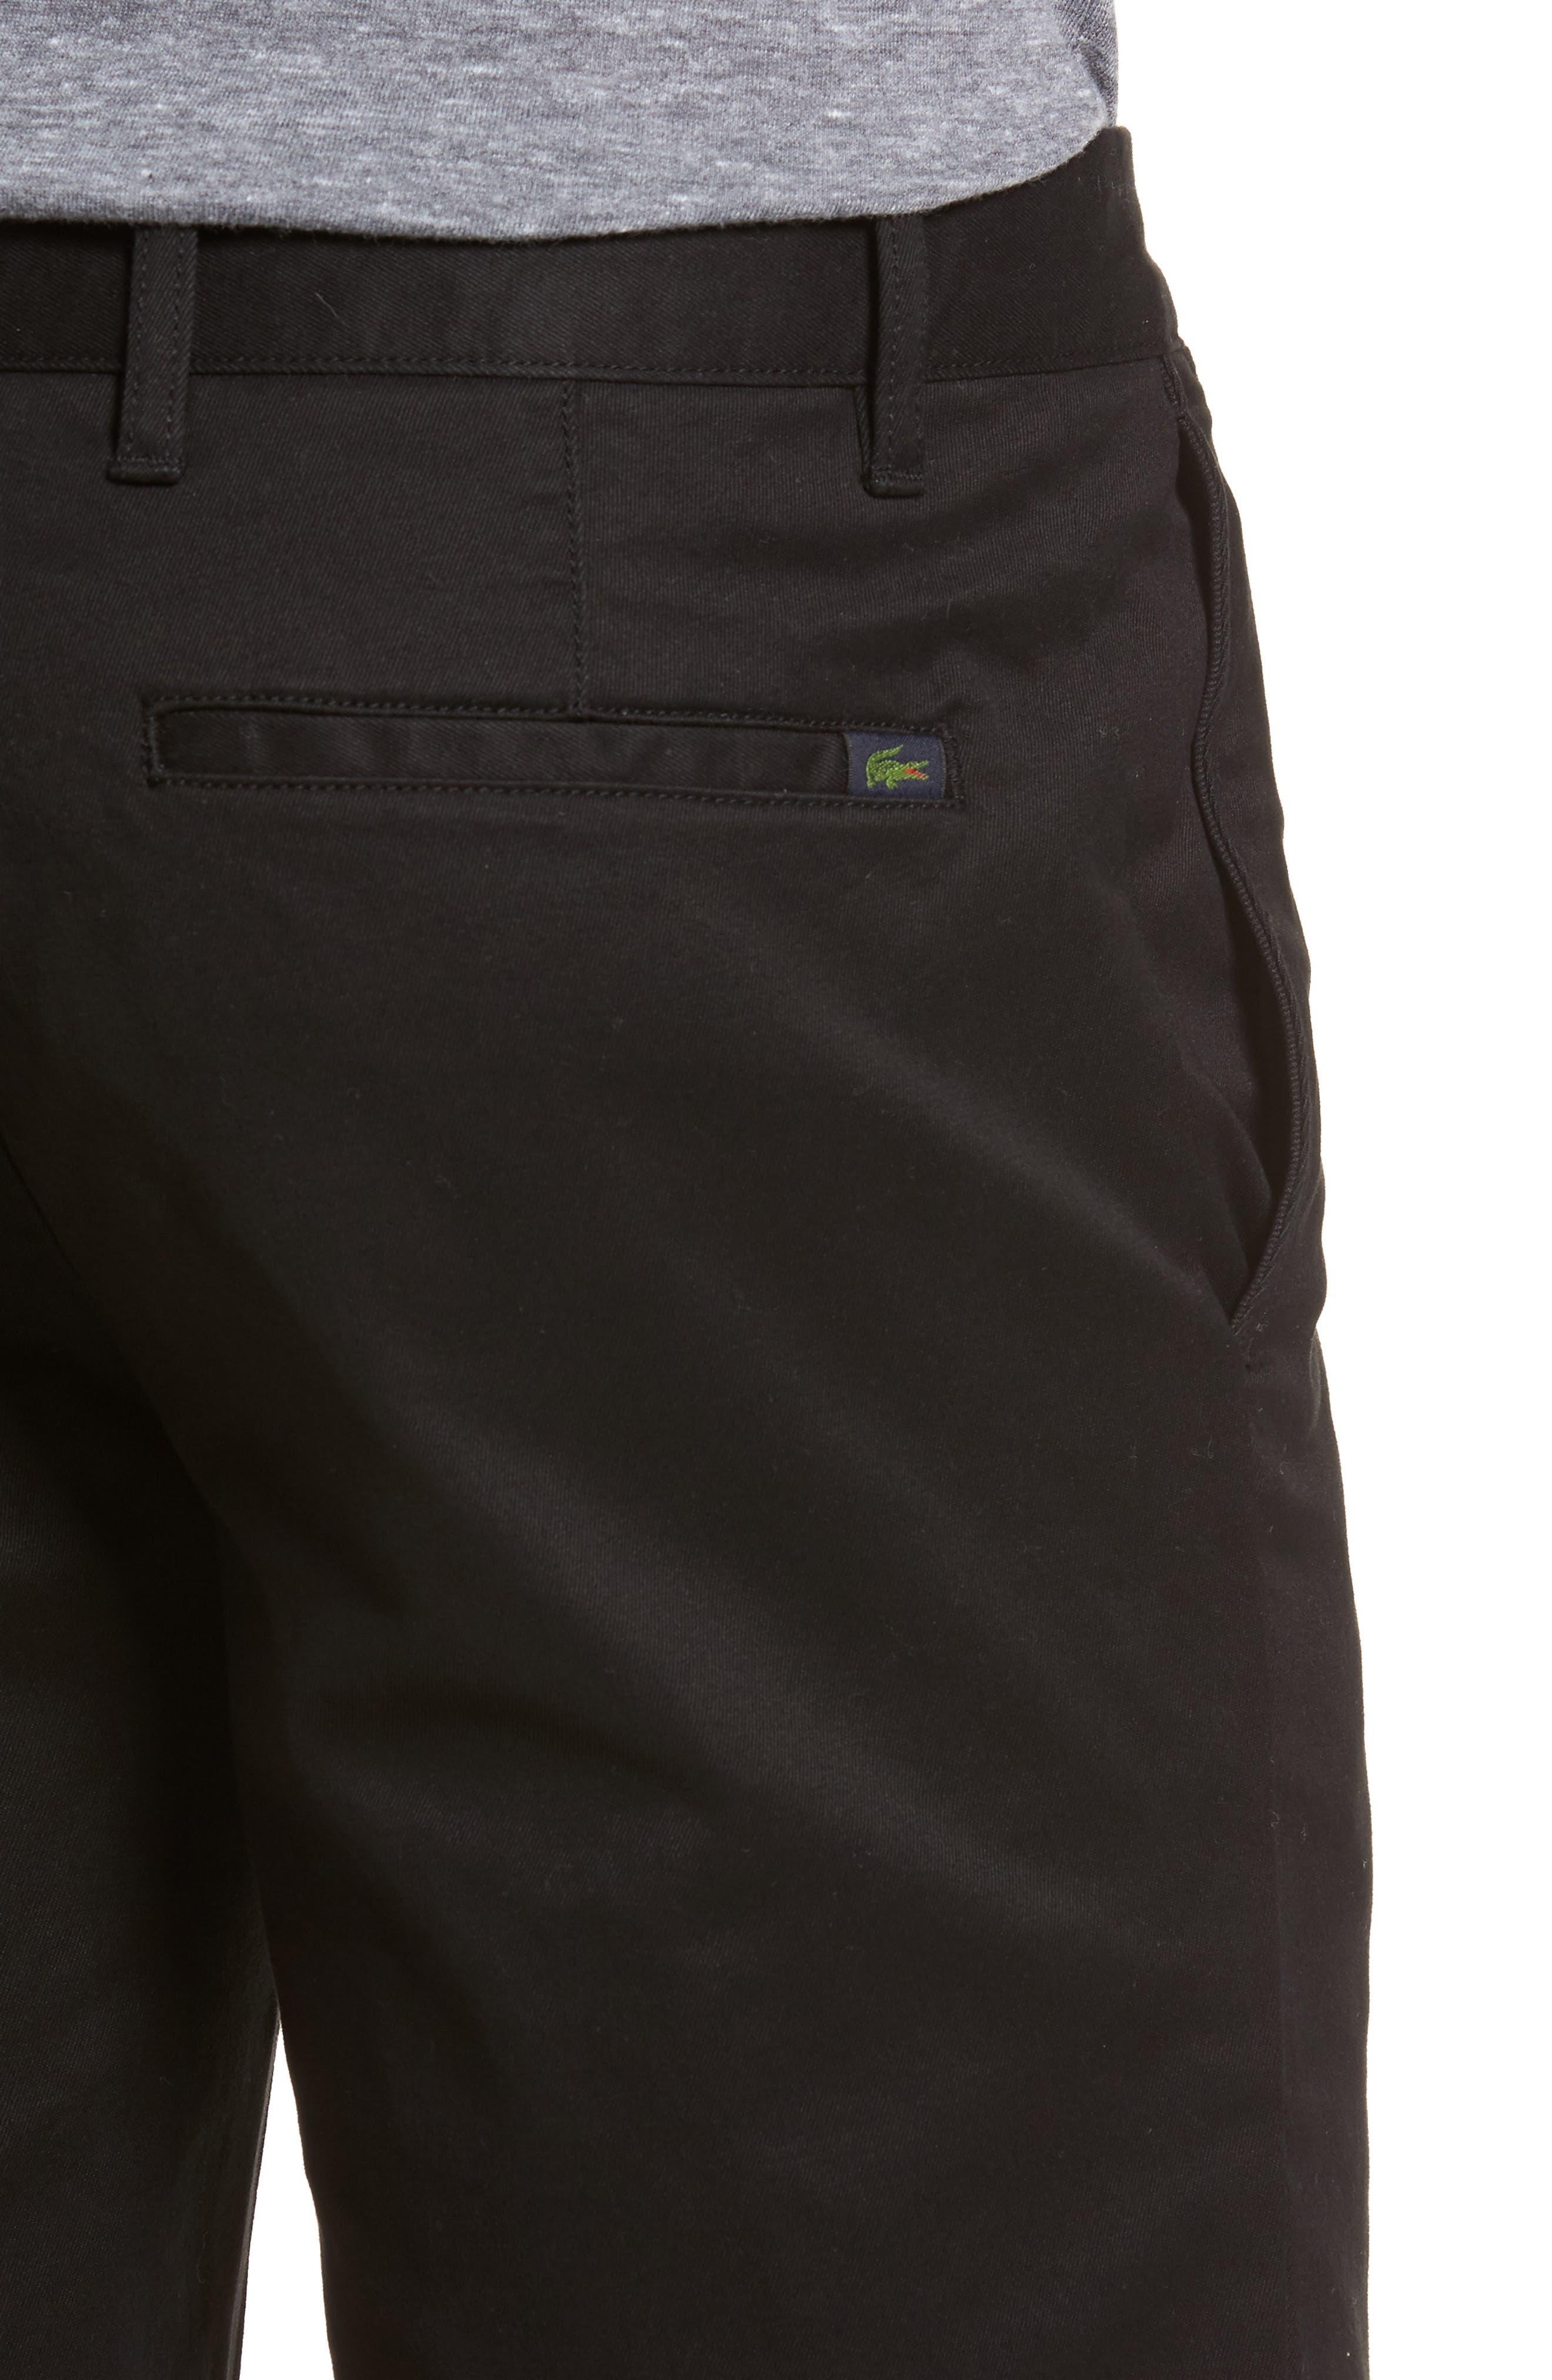 Slim Fit Chino Shorts,                             Alternate thumbnail 4, color,                             001